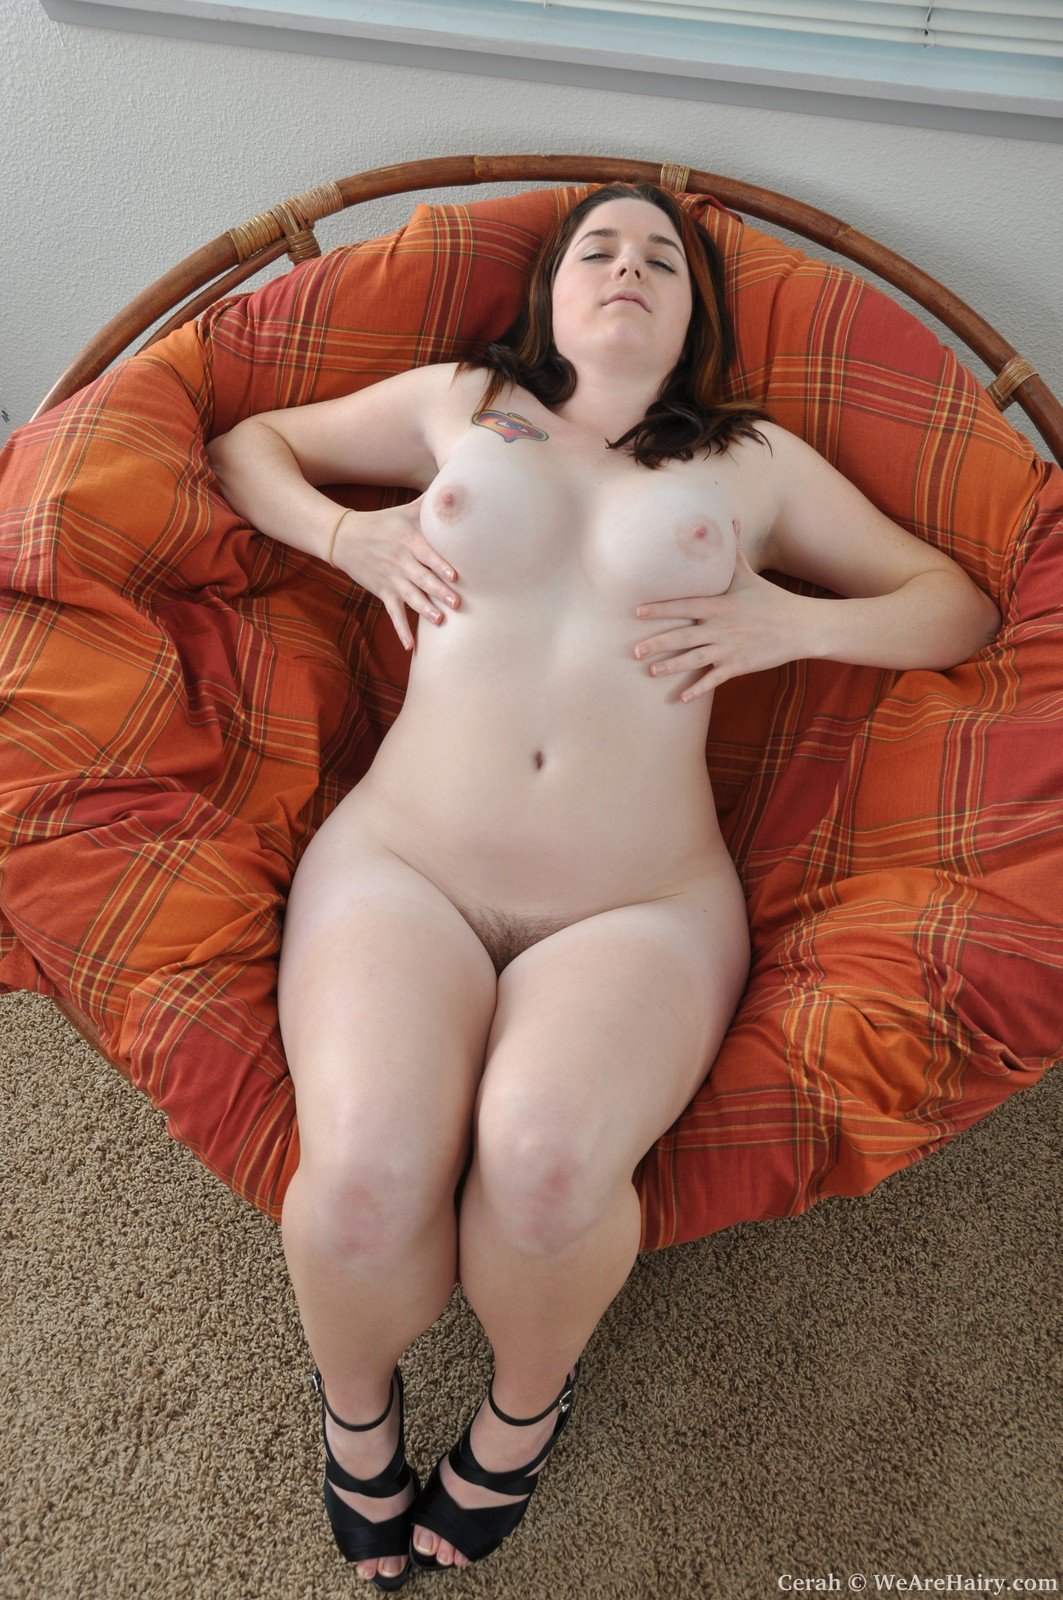 Пизда толстых девушек фото